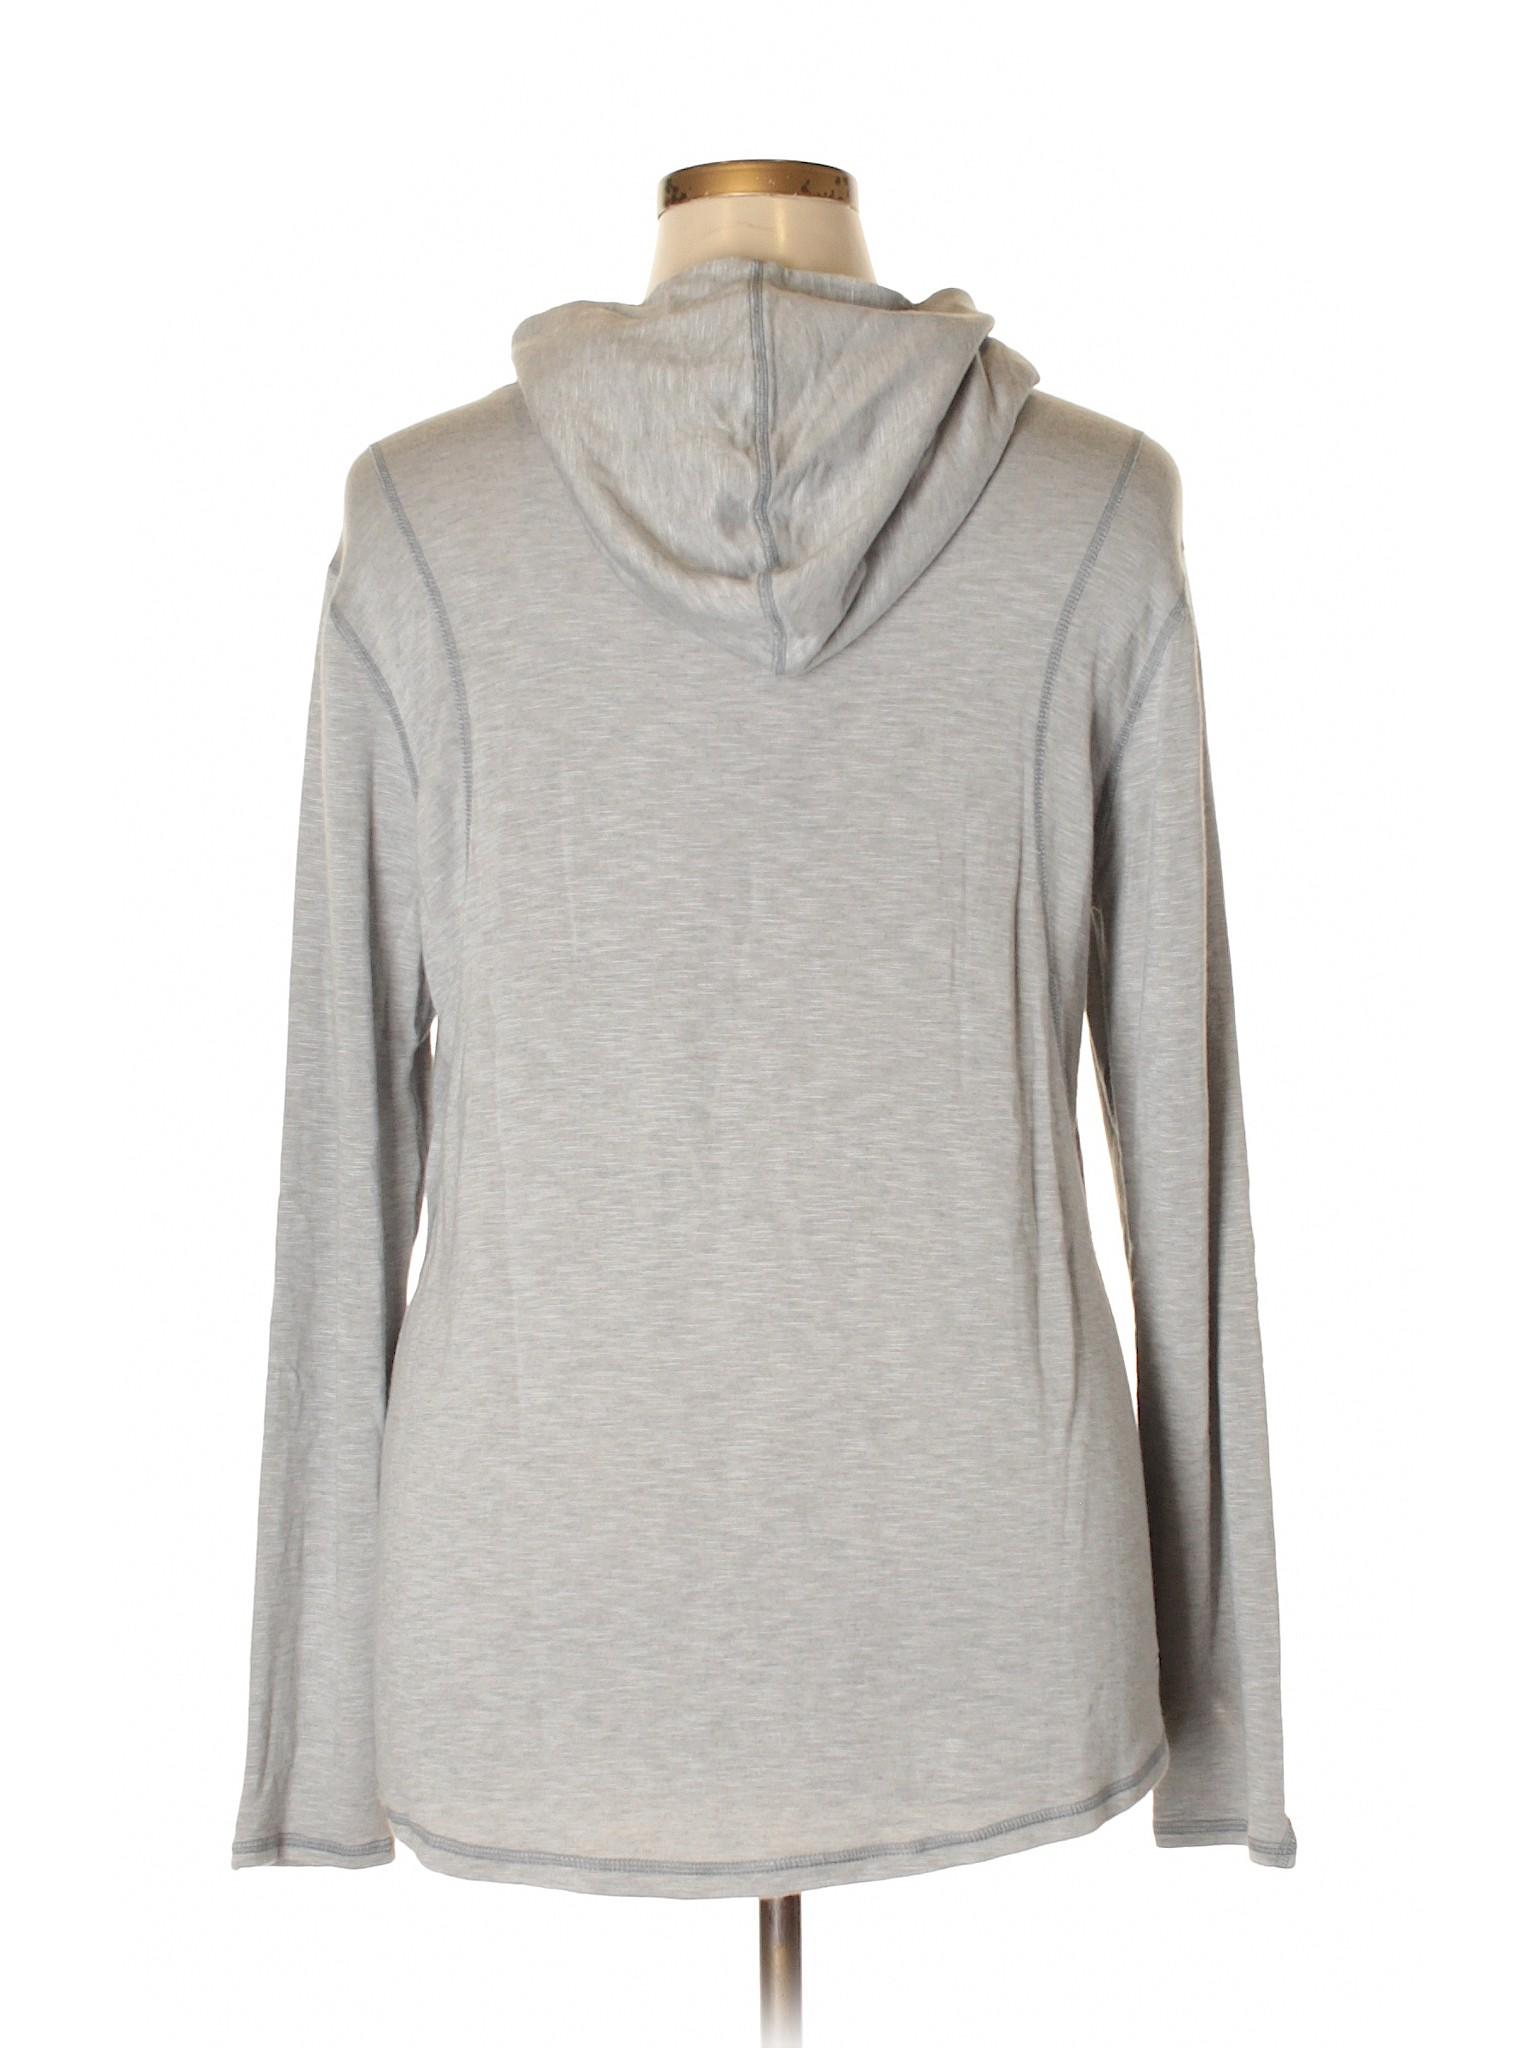 Danskin Sweater Sweater Boutique Danskin Pullover Pullover Boutique 6qqYEaU